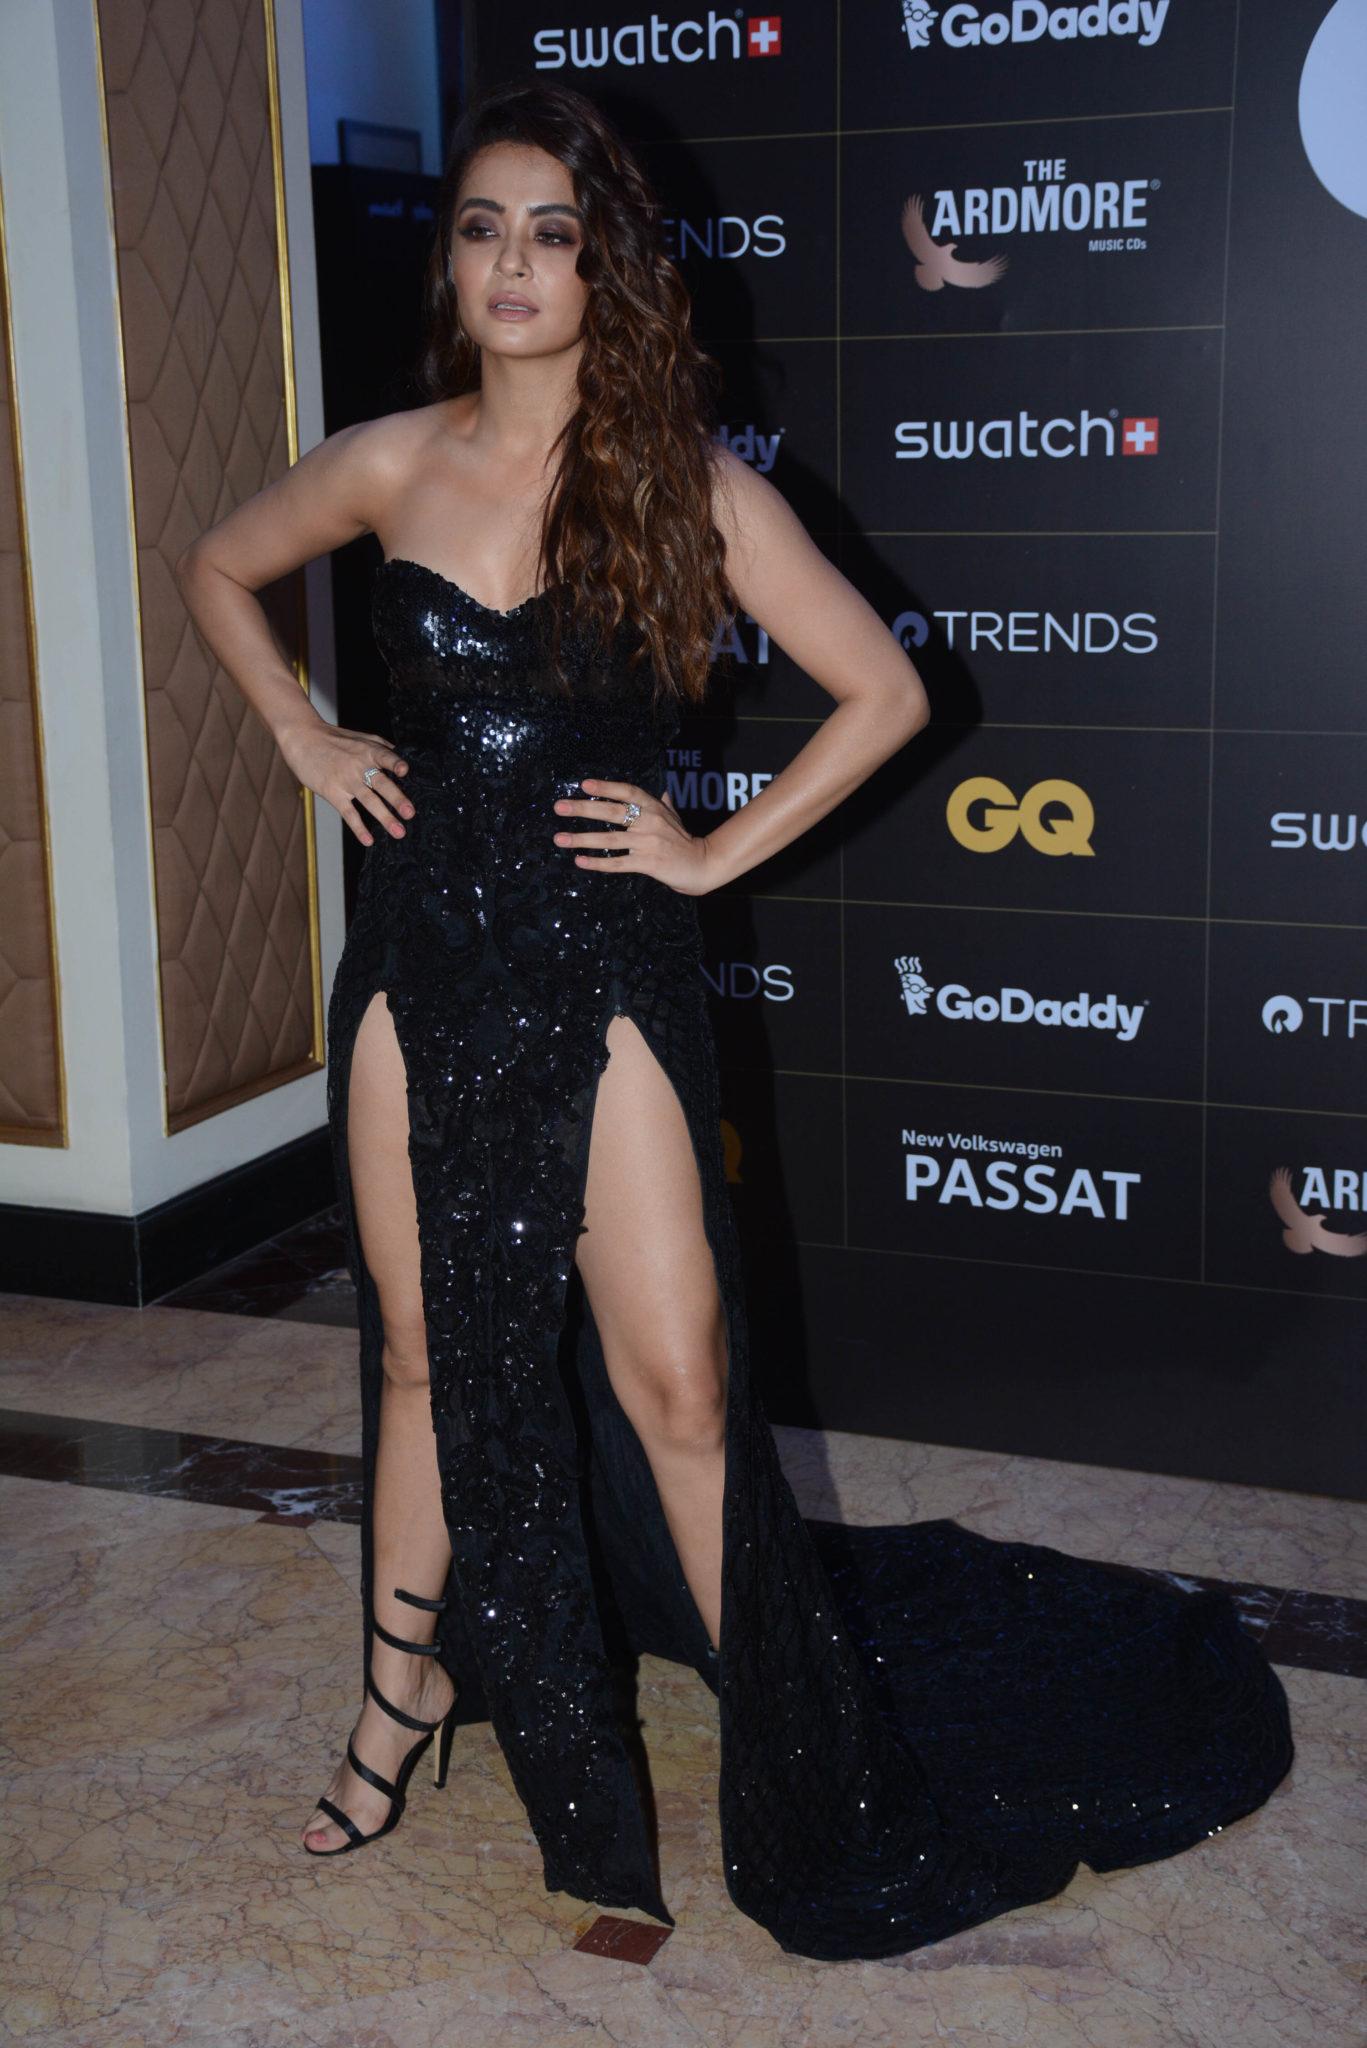 Bollywood Actress,Surveen Chawla,GQ Style Awards,Adjust Dress